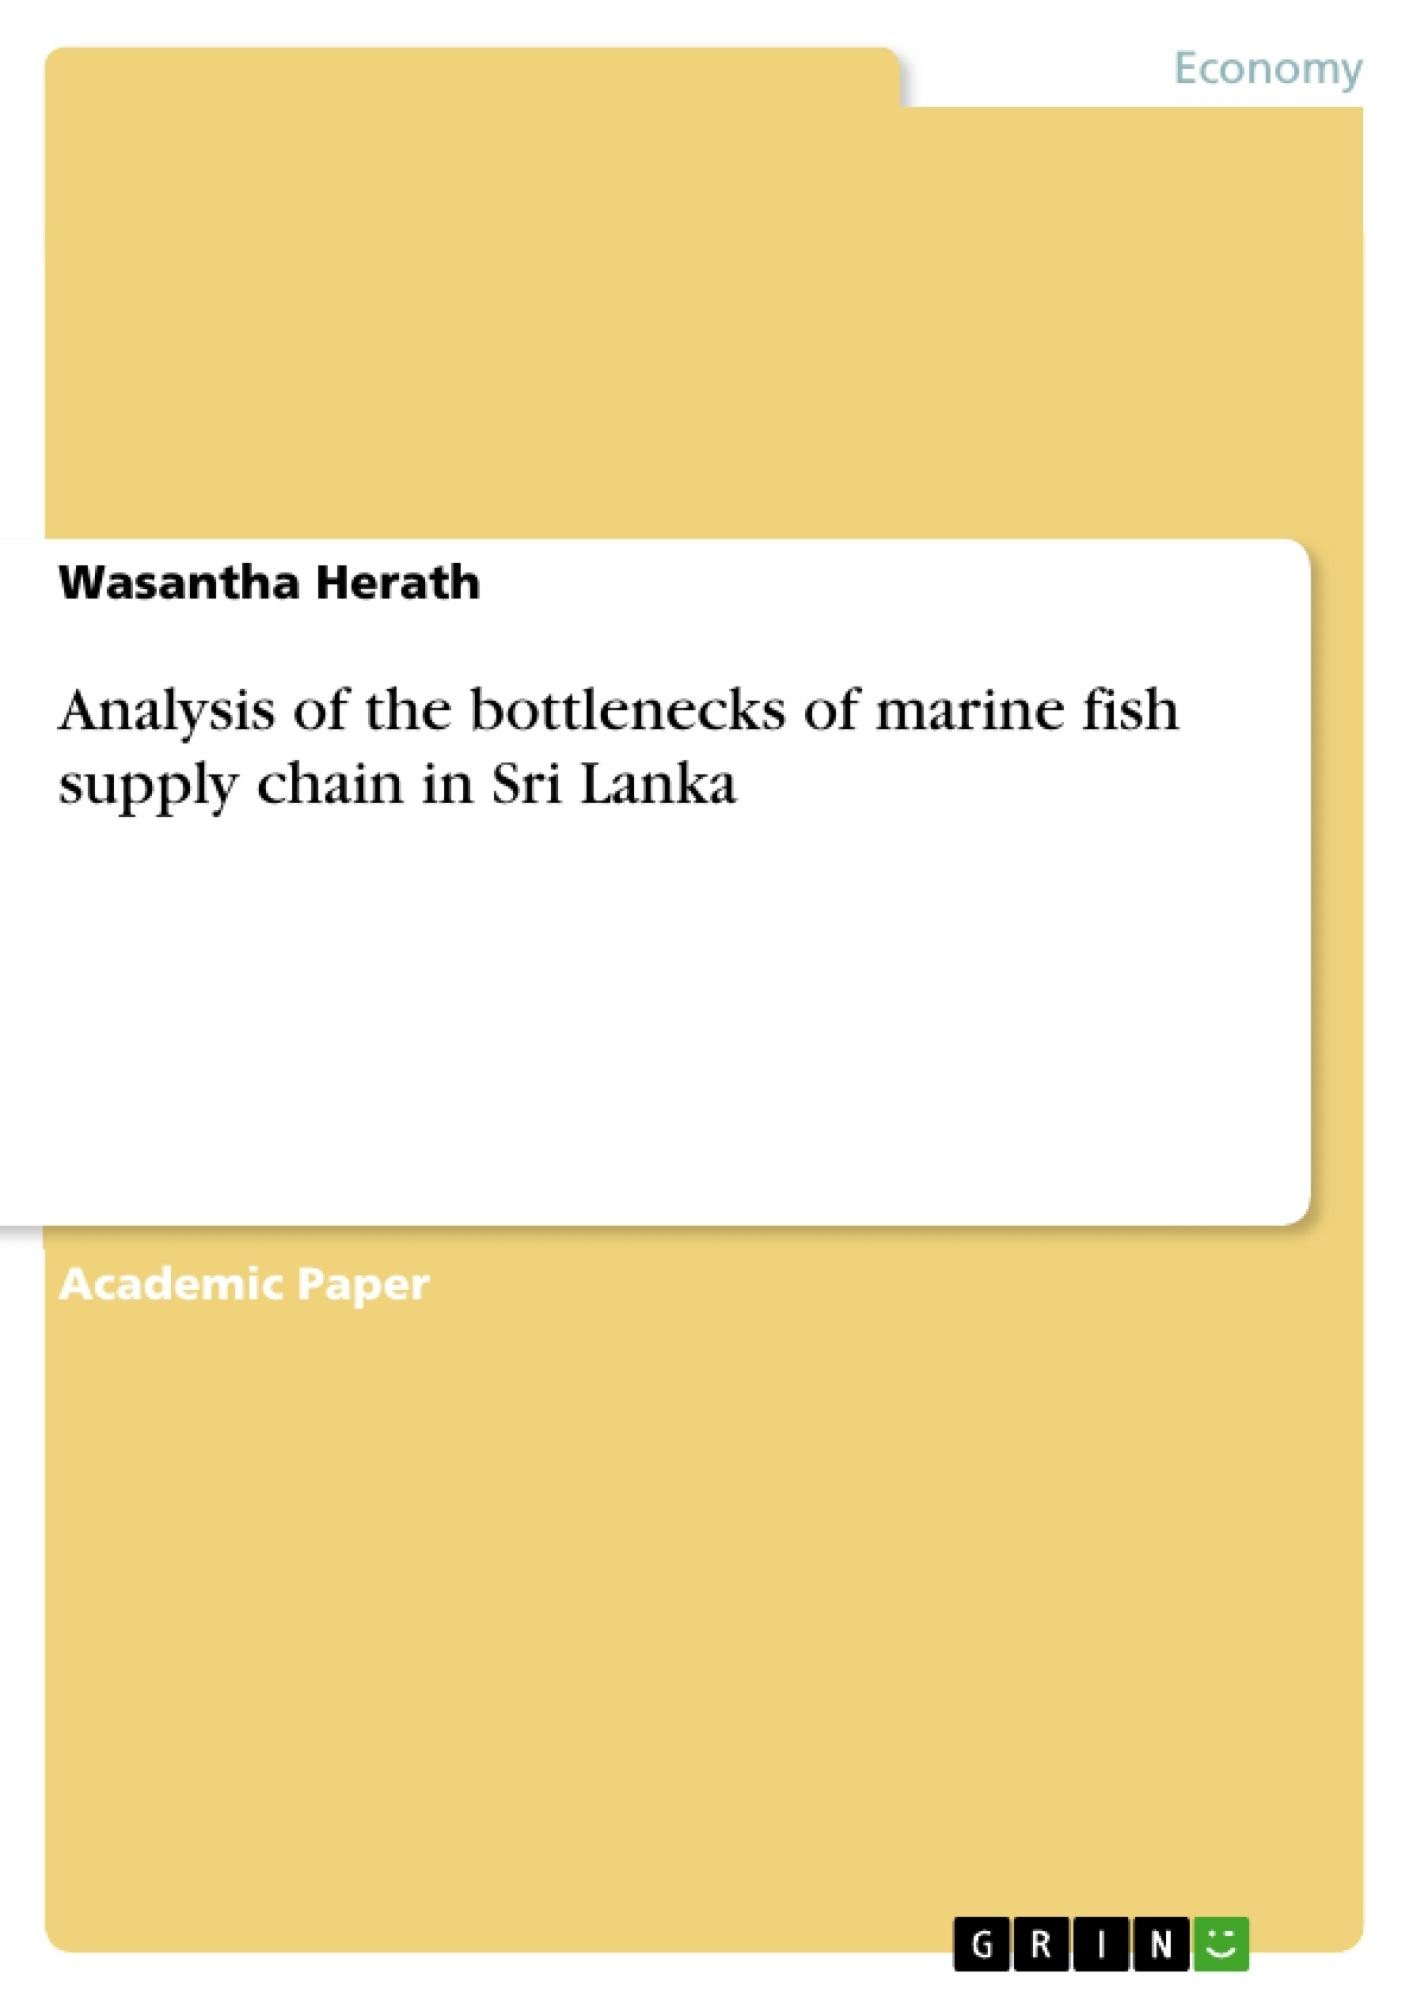 Title: Analysis of the bottlenecks of marine fish supply chain in Sri Lanka